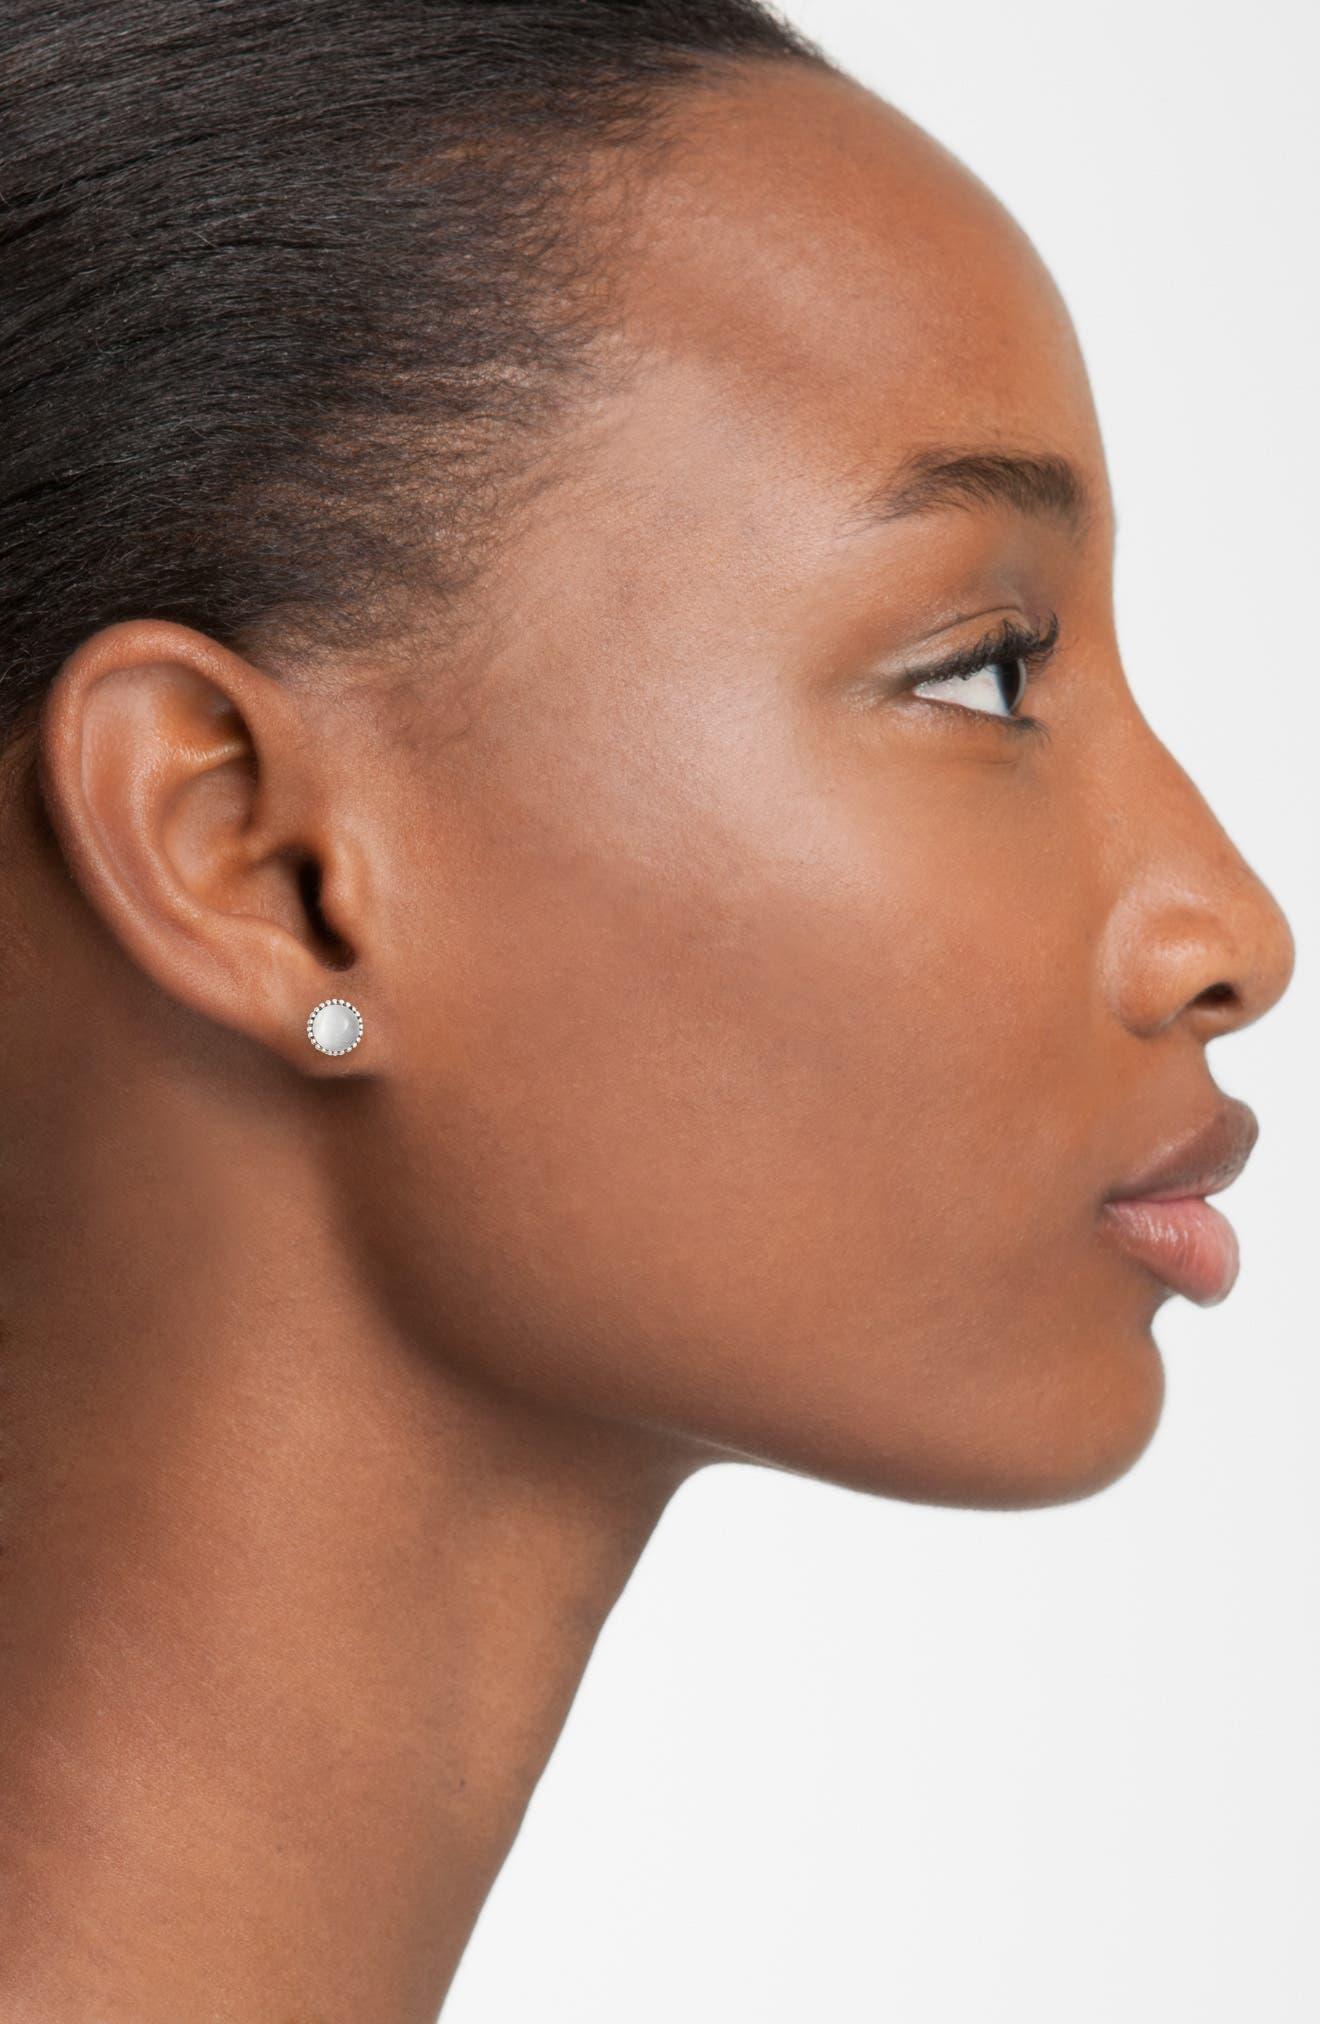 Set of 4 Stud Earrings,                             Alternate thumbnail 2, color,                             040